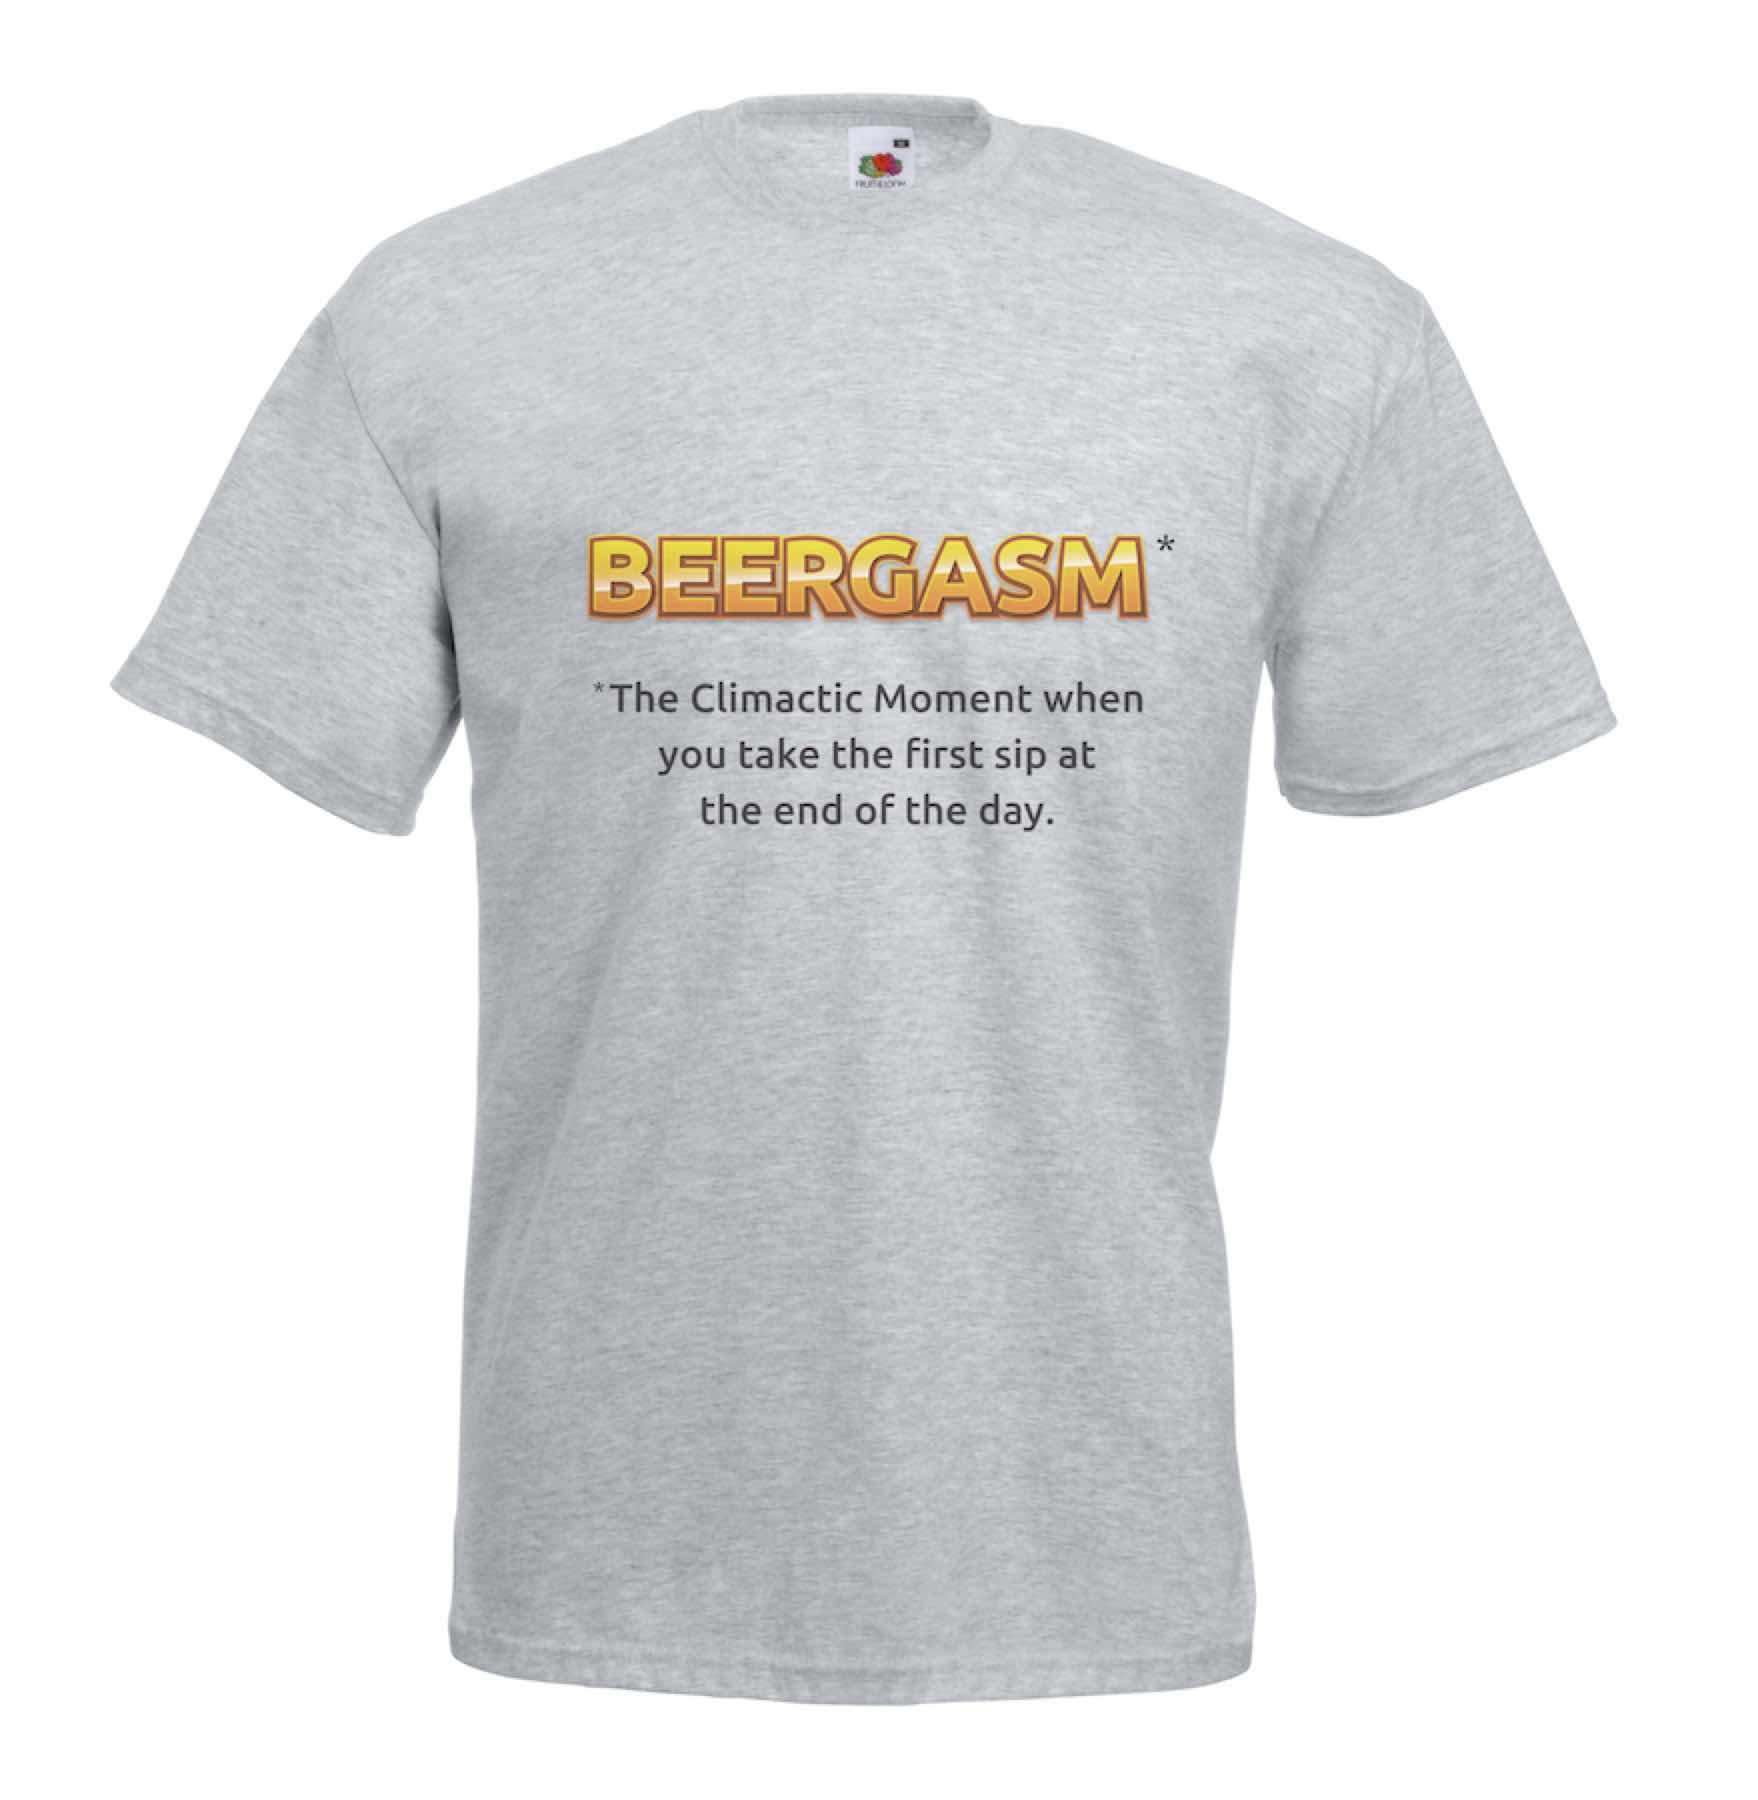 Beergasm design for t-shirt, hoodie & sweatshirt